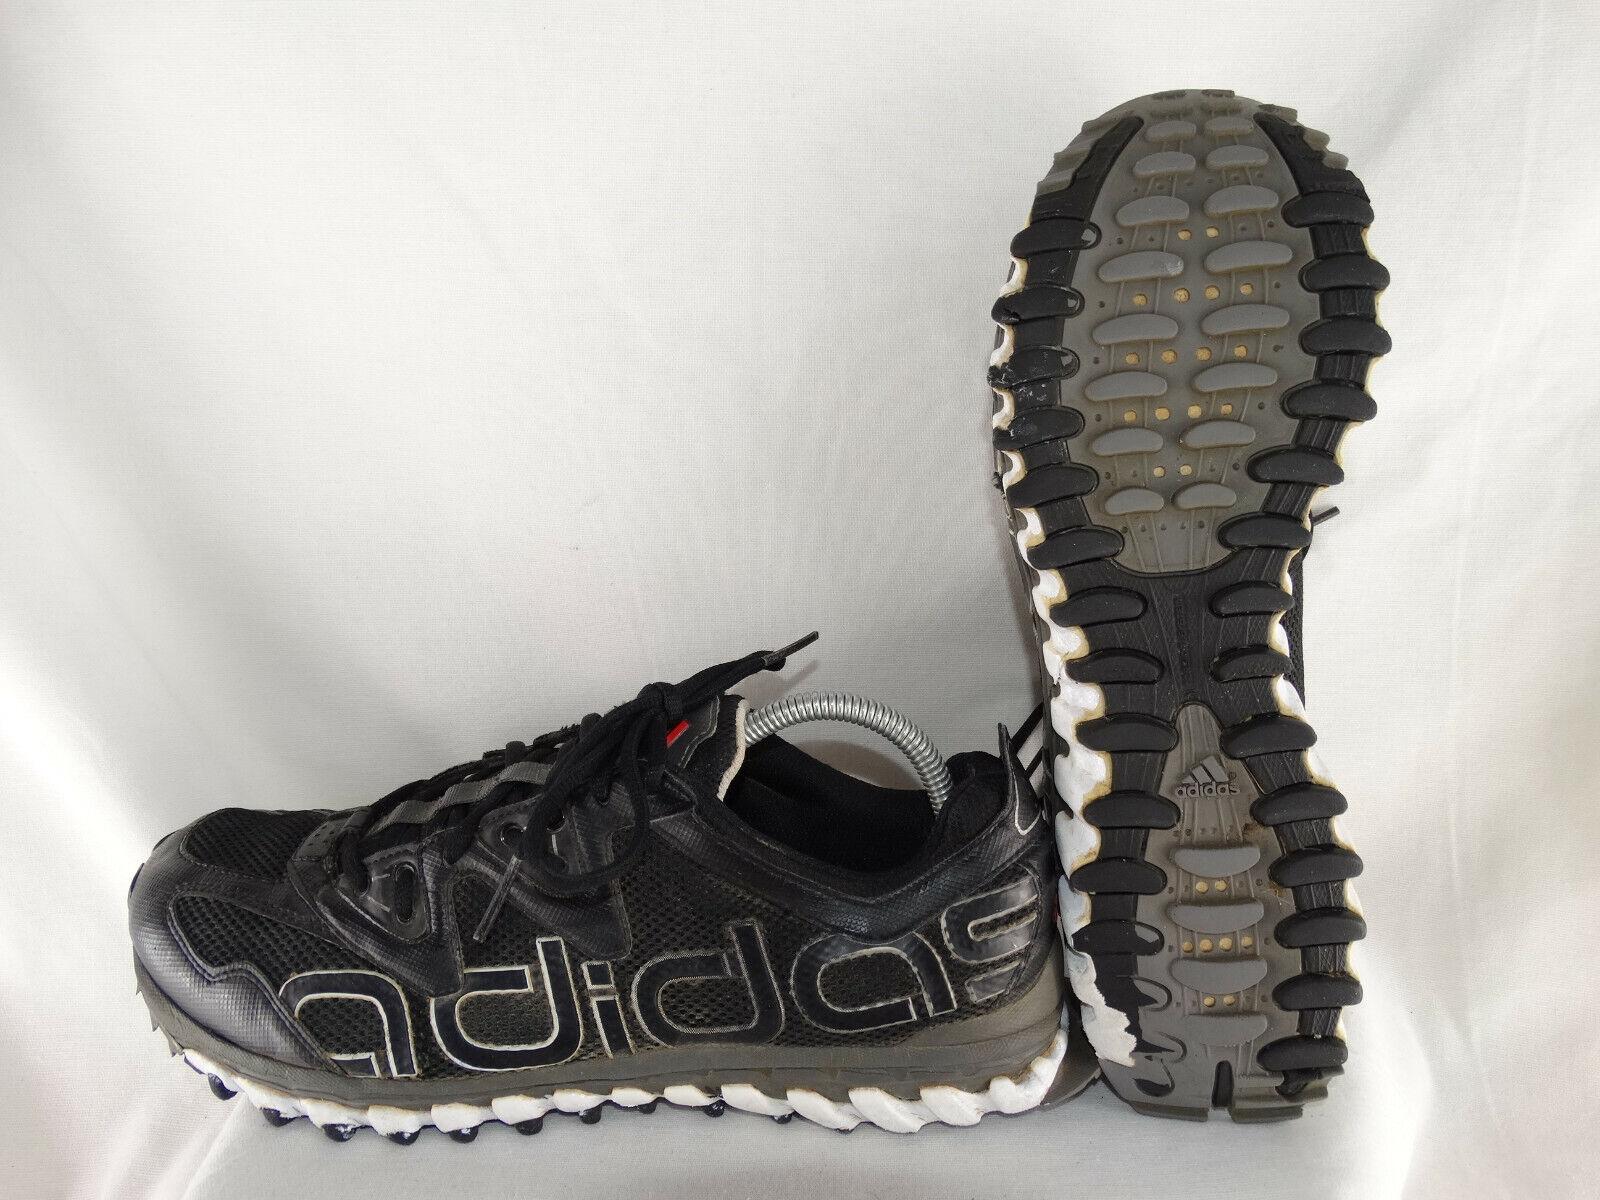 Adidas Vigor TR 2 Trail Laufschuhe G56257 schwarz-weiß EU 45 1 3 UK 10,5